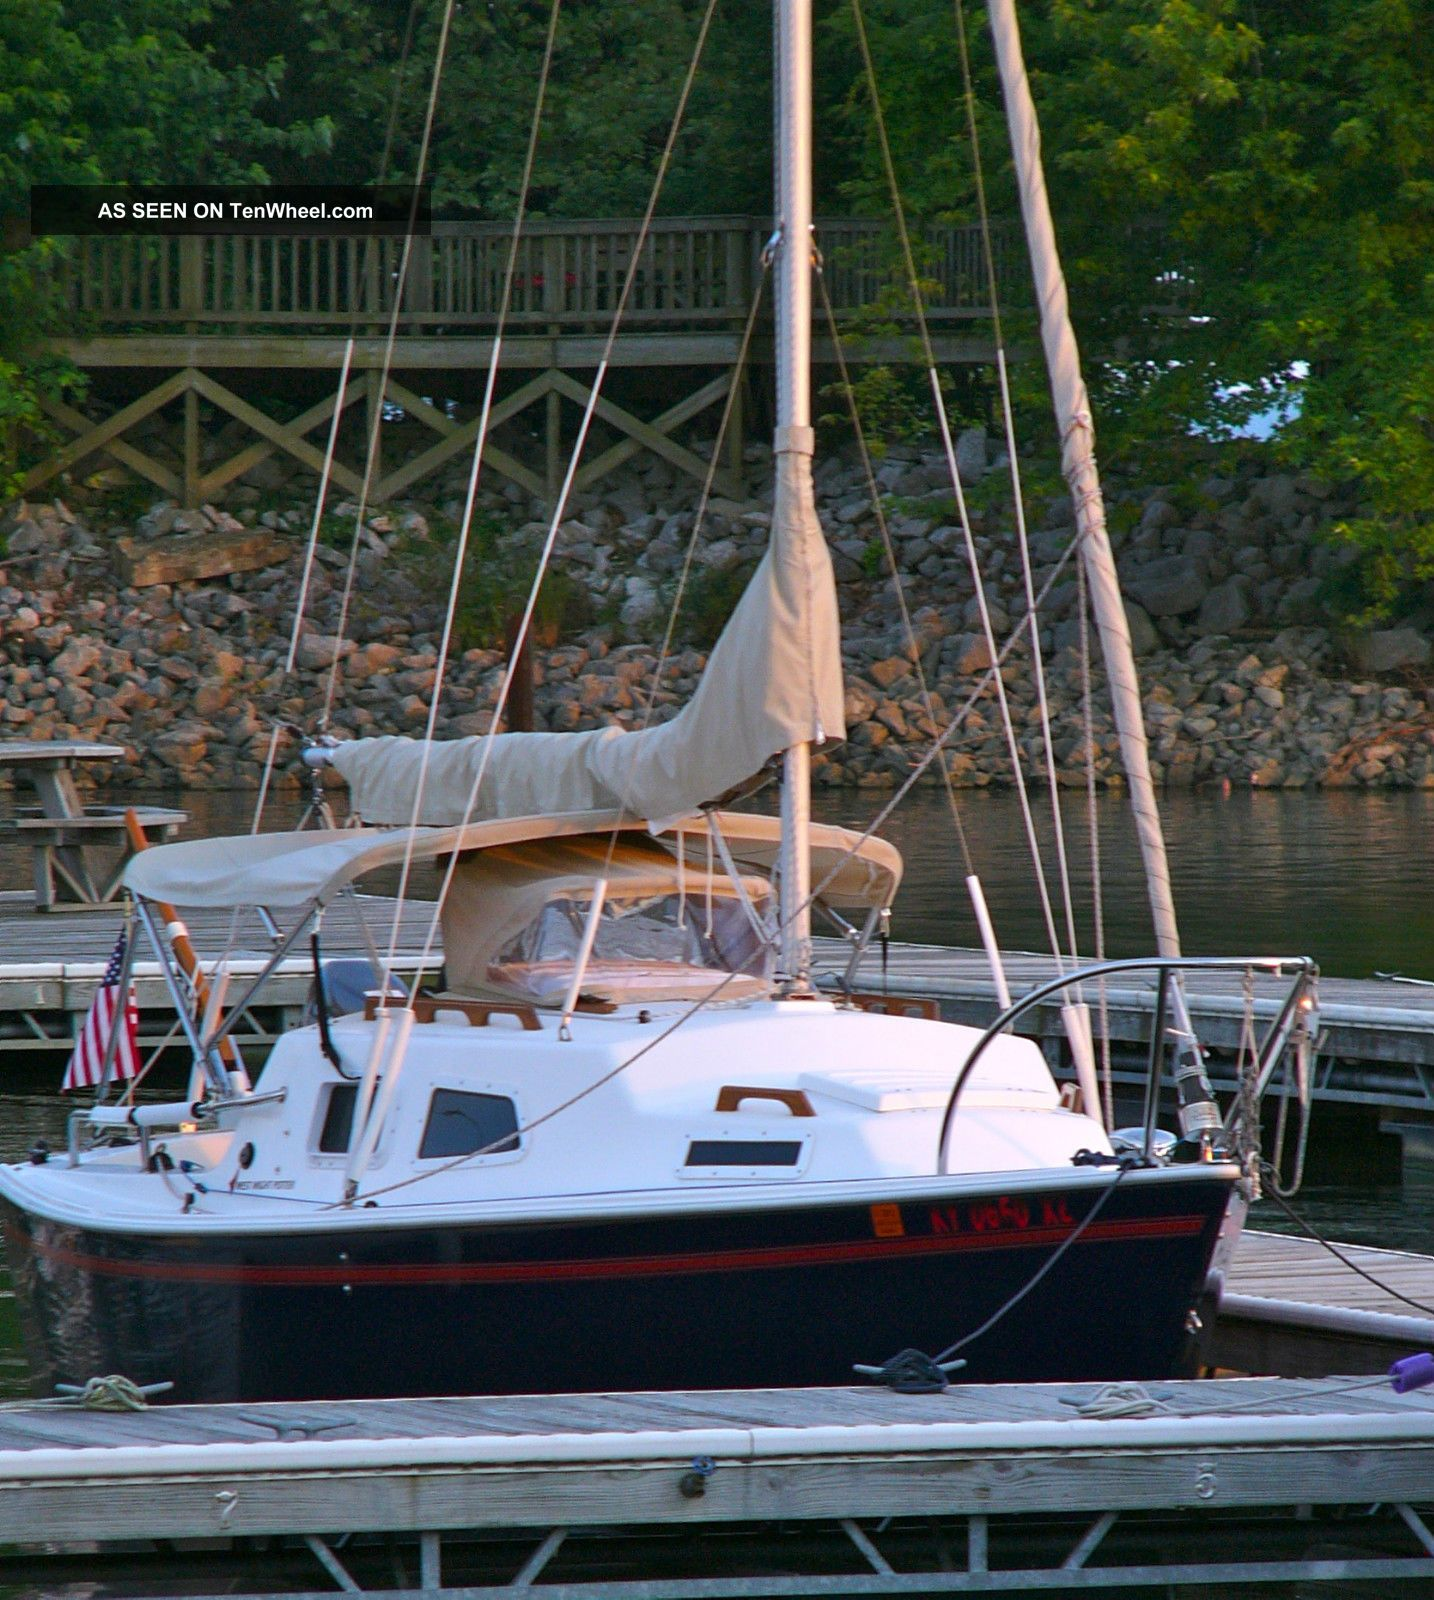 2001 International Marine West Wight Potter 19 Sailboats Under 20 feet photo